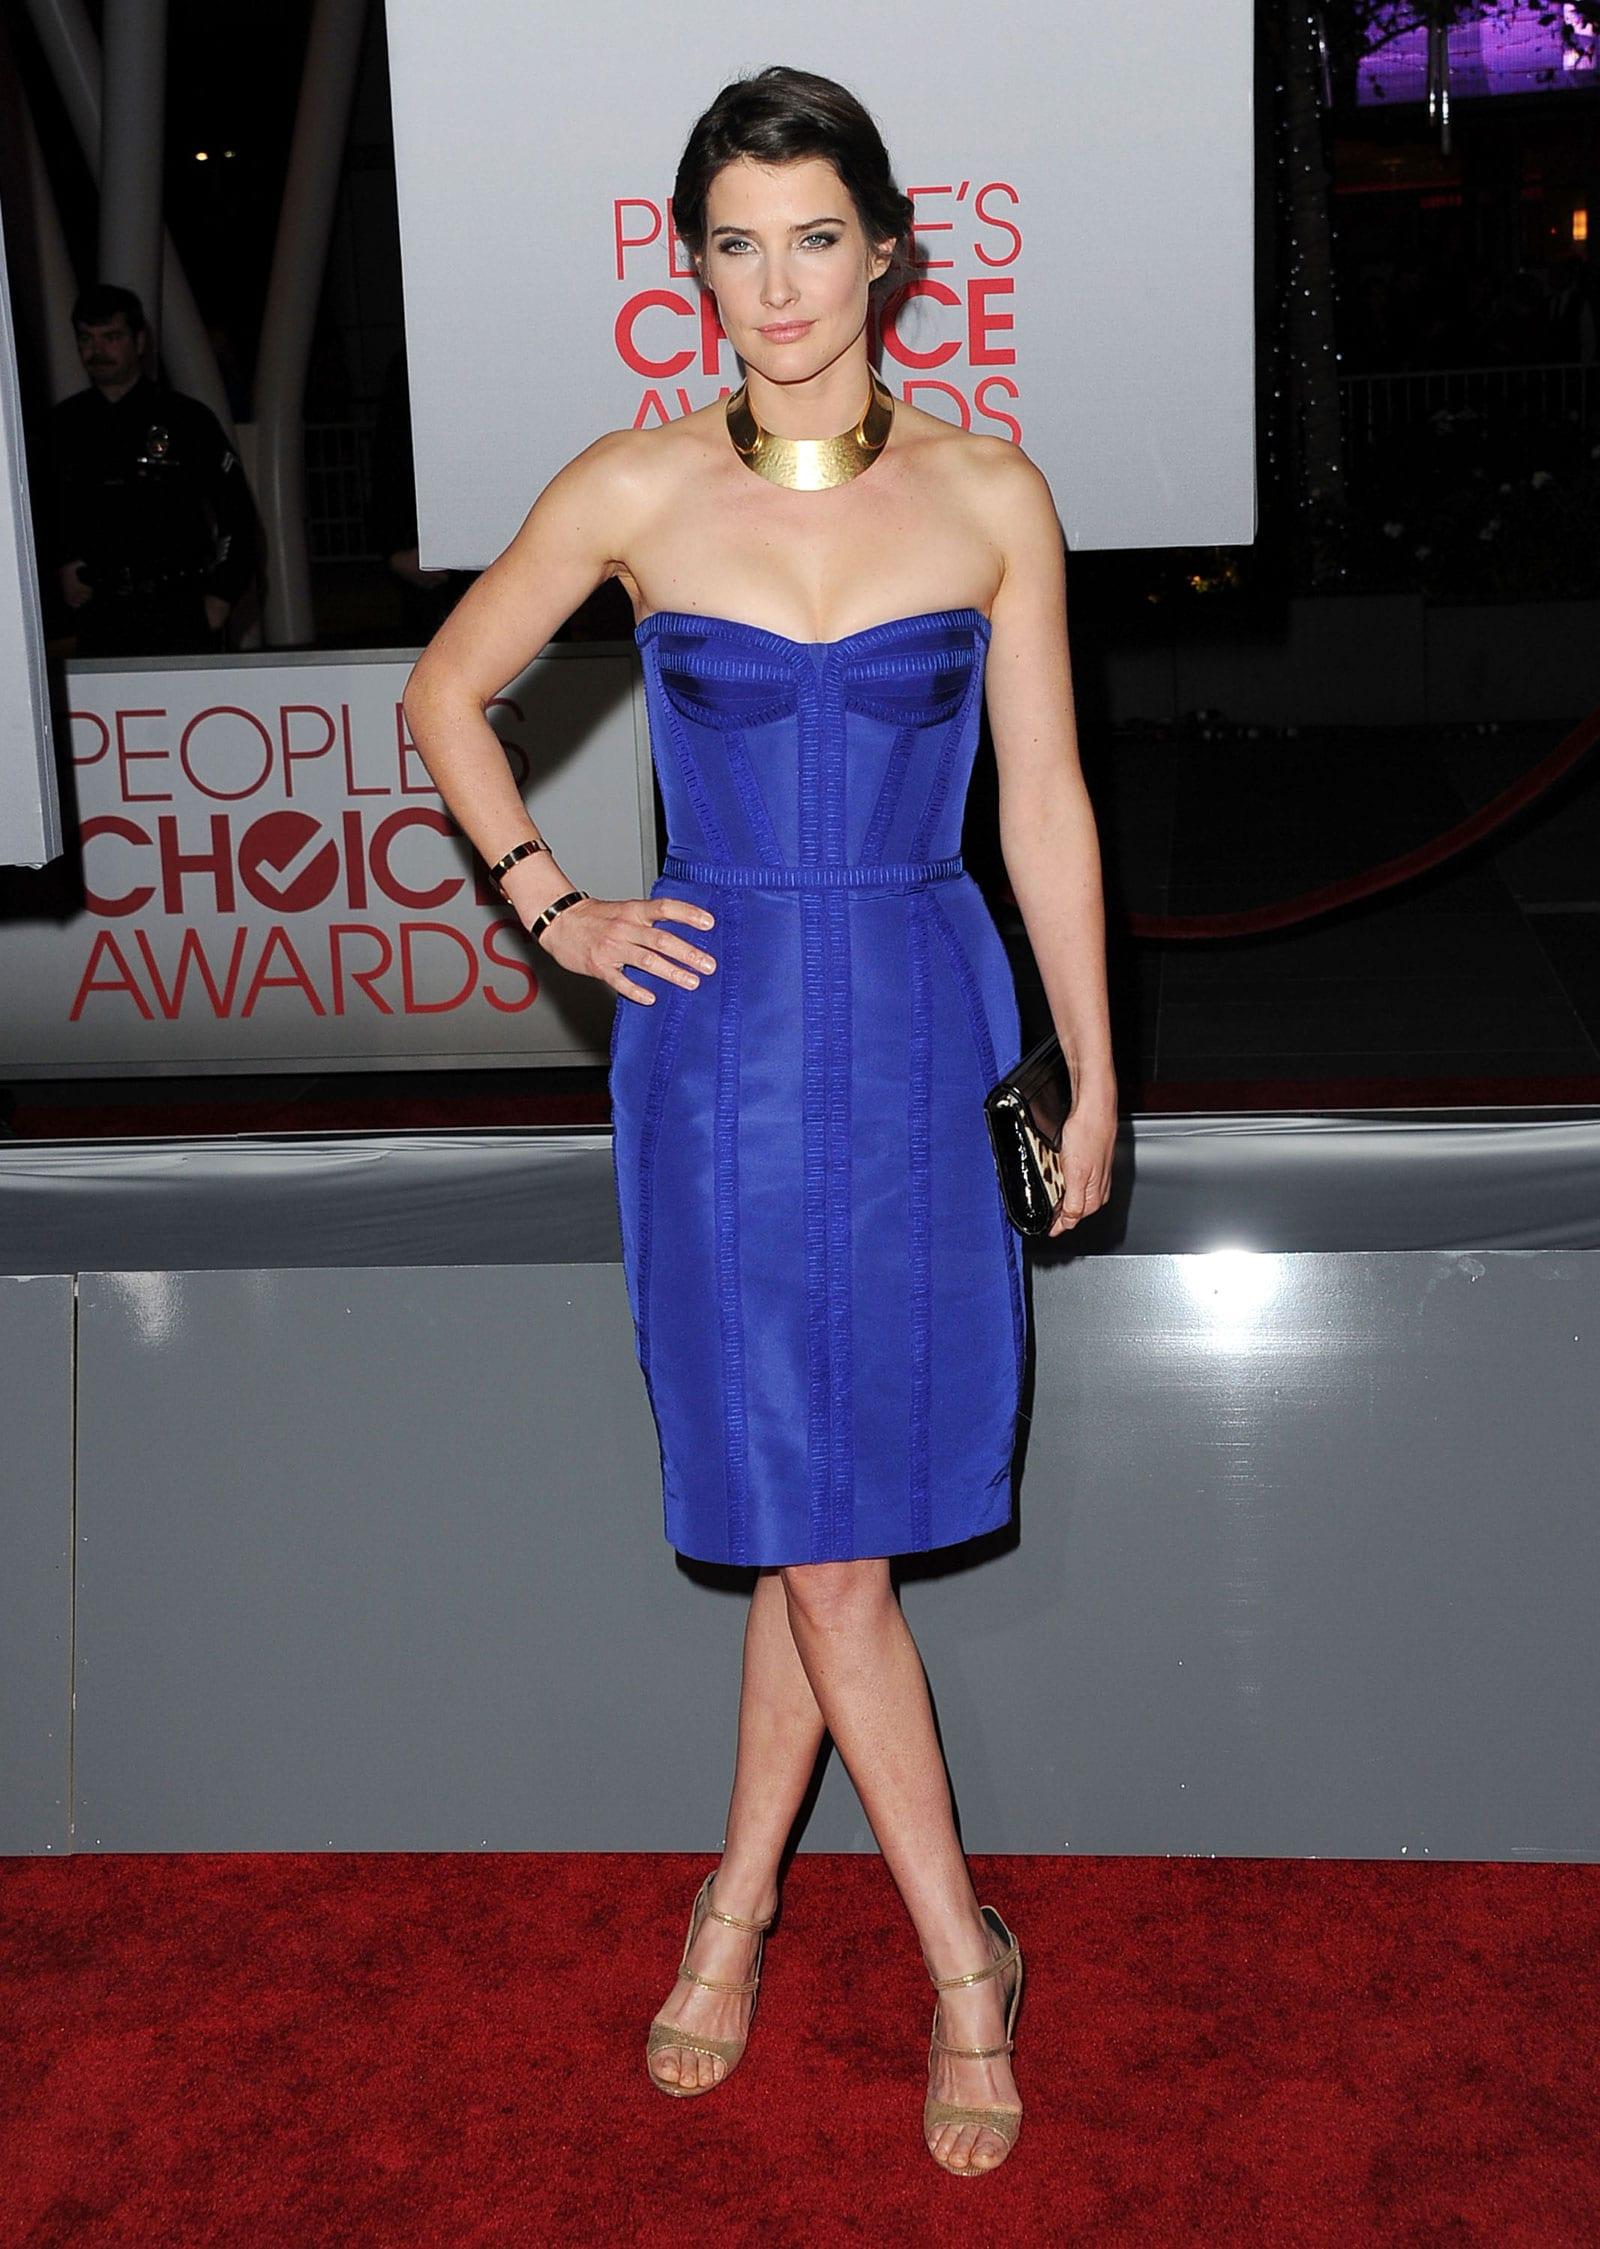 Cobie Smulders Widescreen